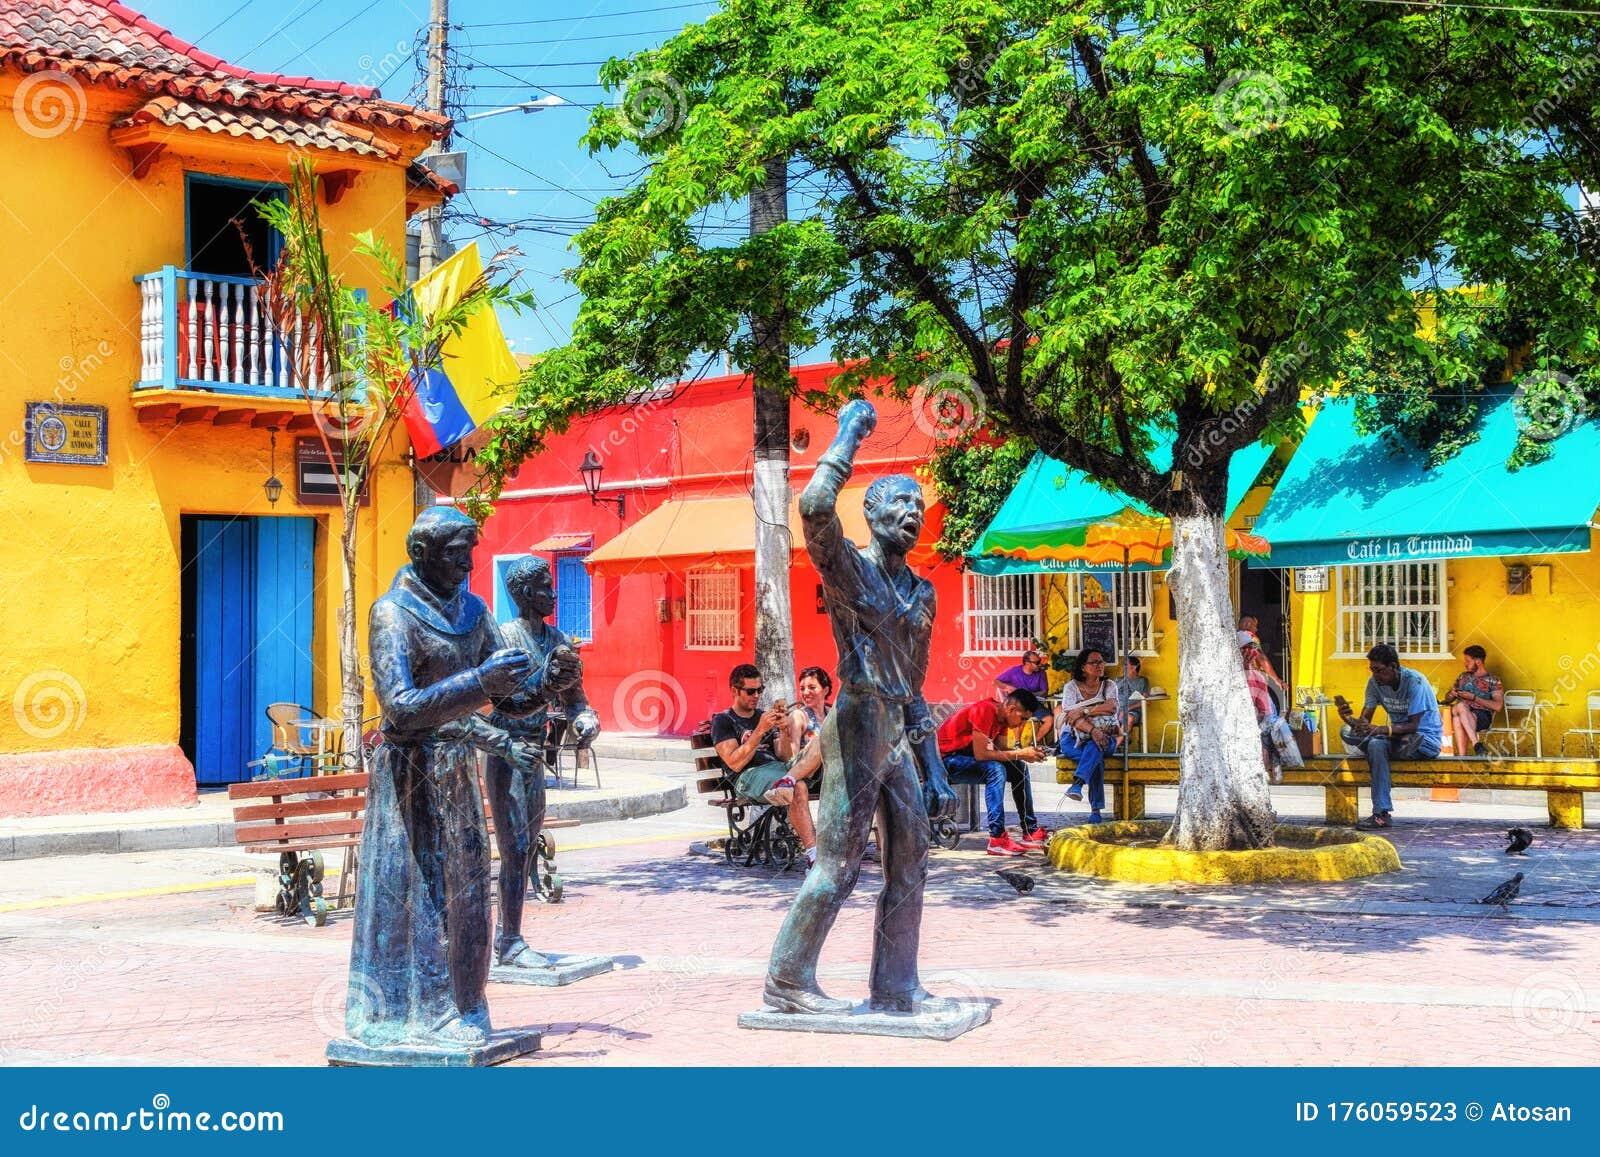 Statues Outside Iglesia De La Trinidad In Getsemani Cartagena Colombia Editorial Stock Photo Image Of Colombia City 176059523